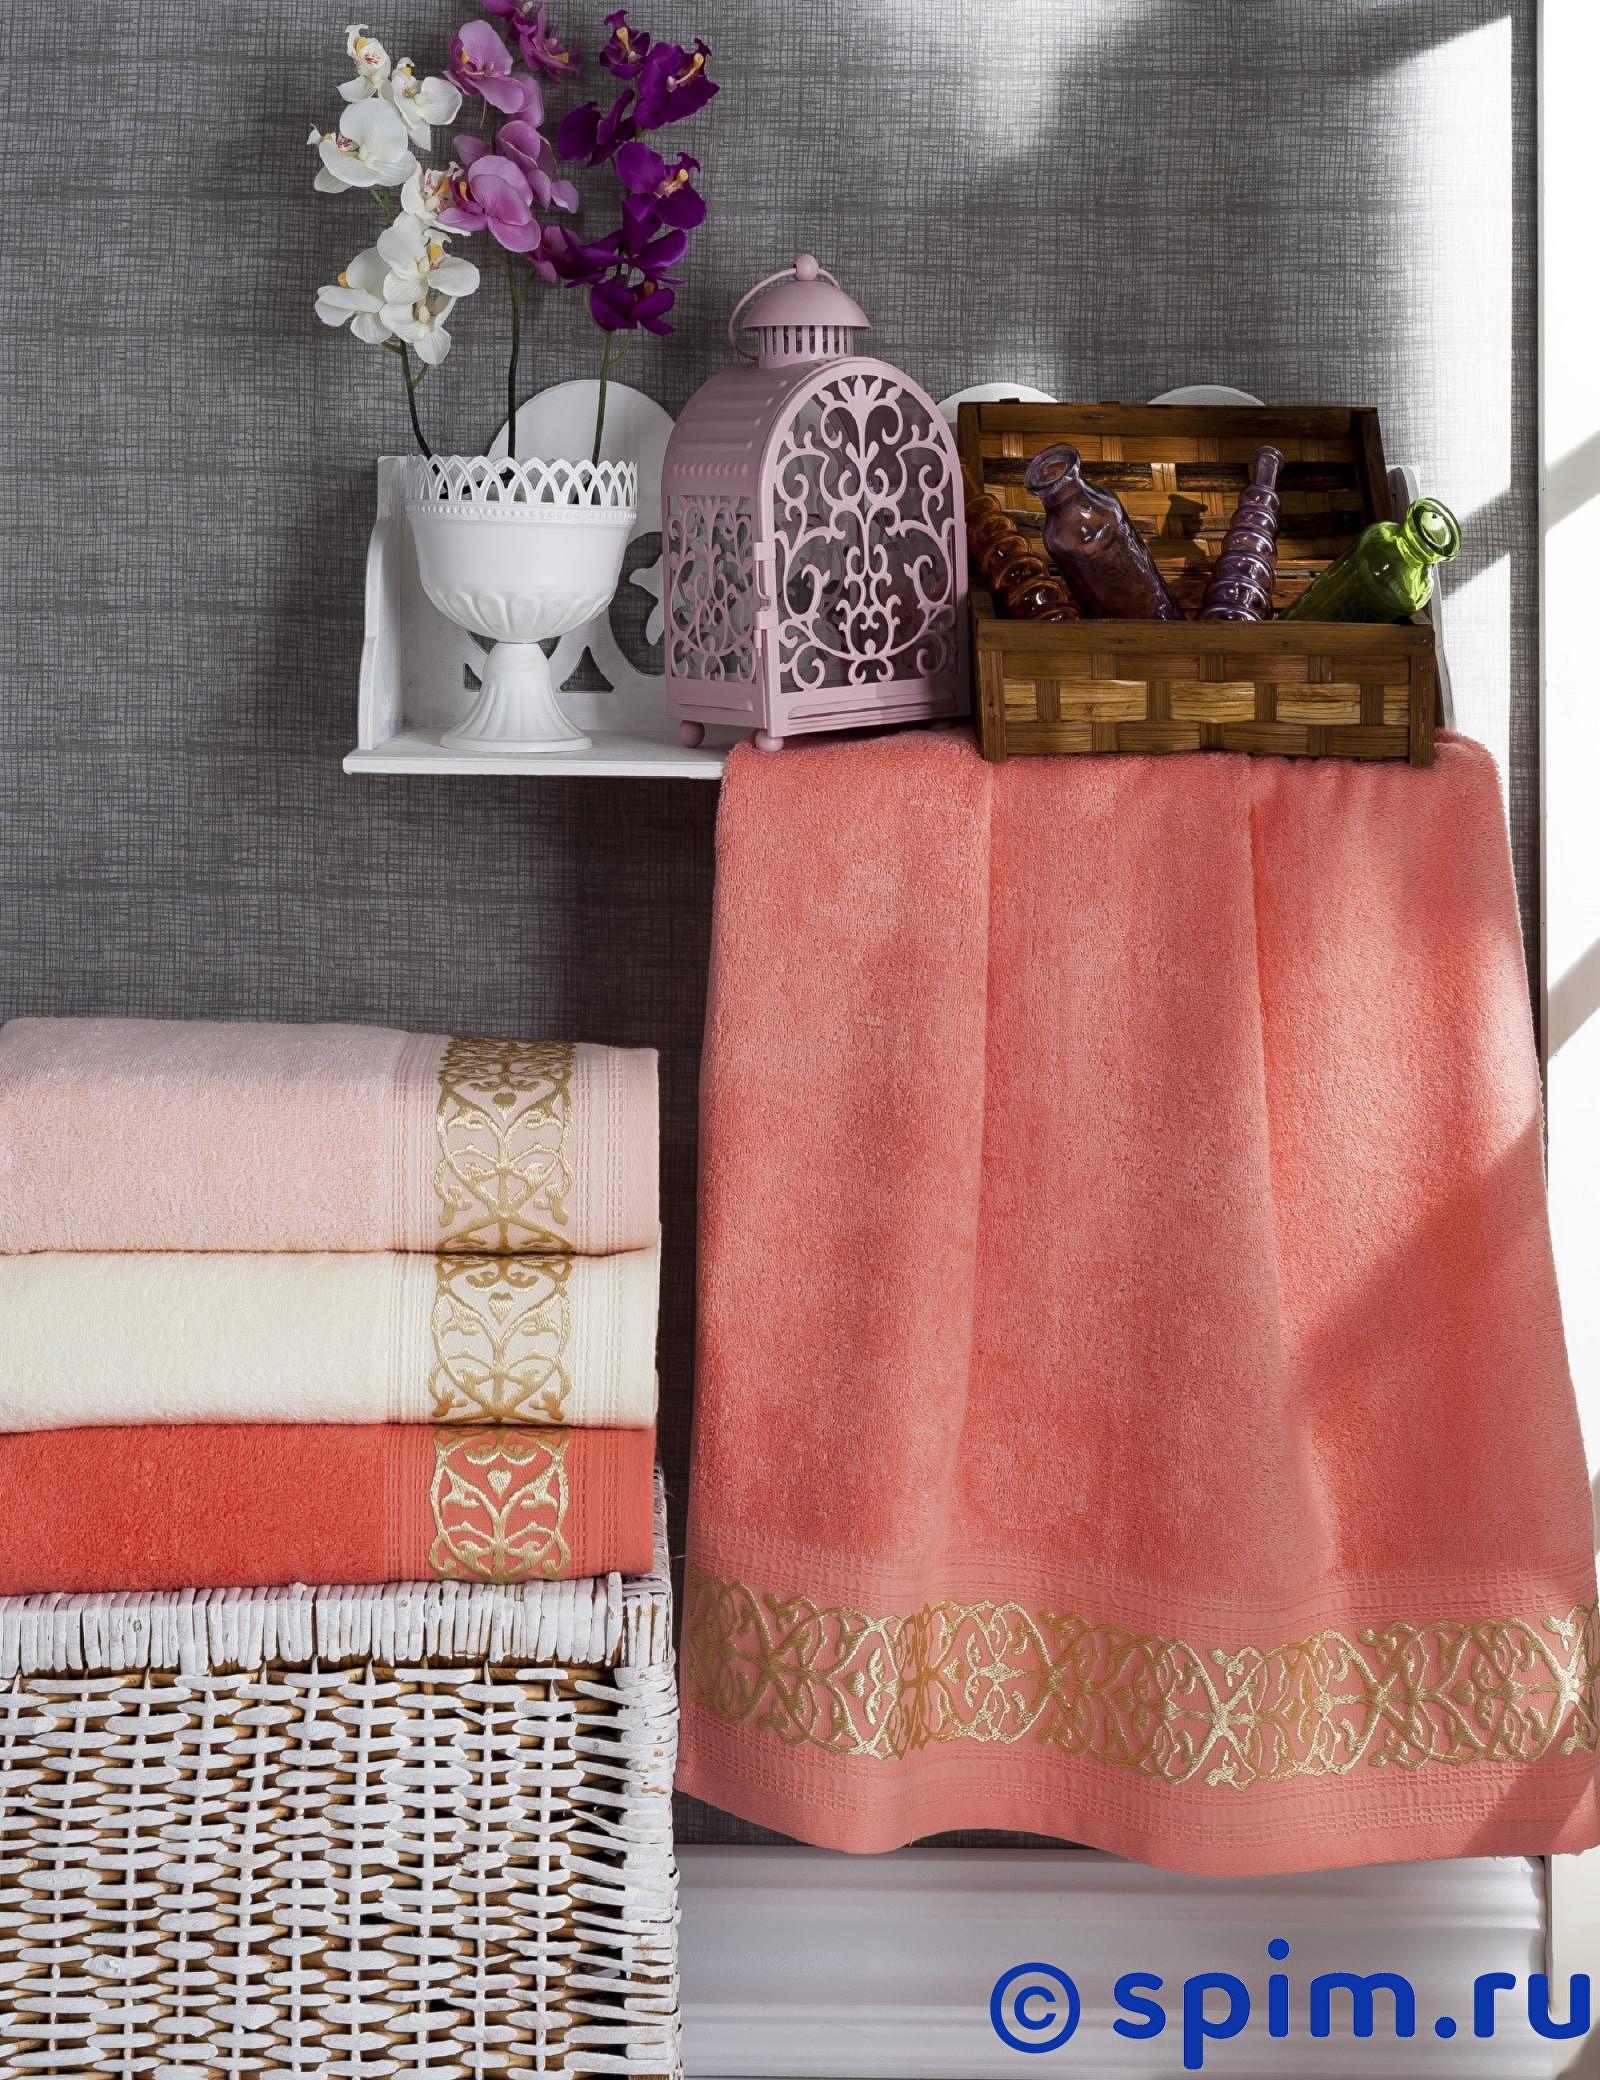 Набор из 4-х полотенец Do&co Selena 70х140 см полотенца do n co полотенце lady цвет мятный набор